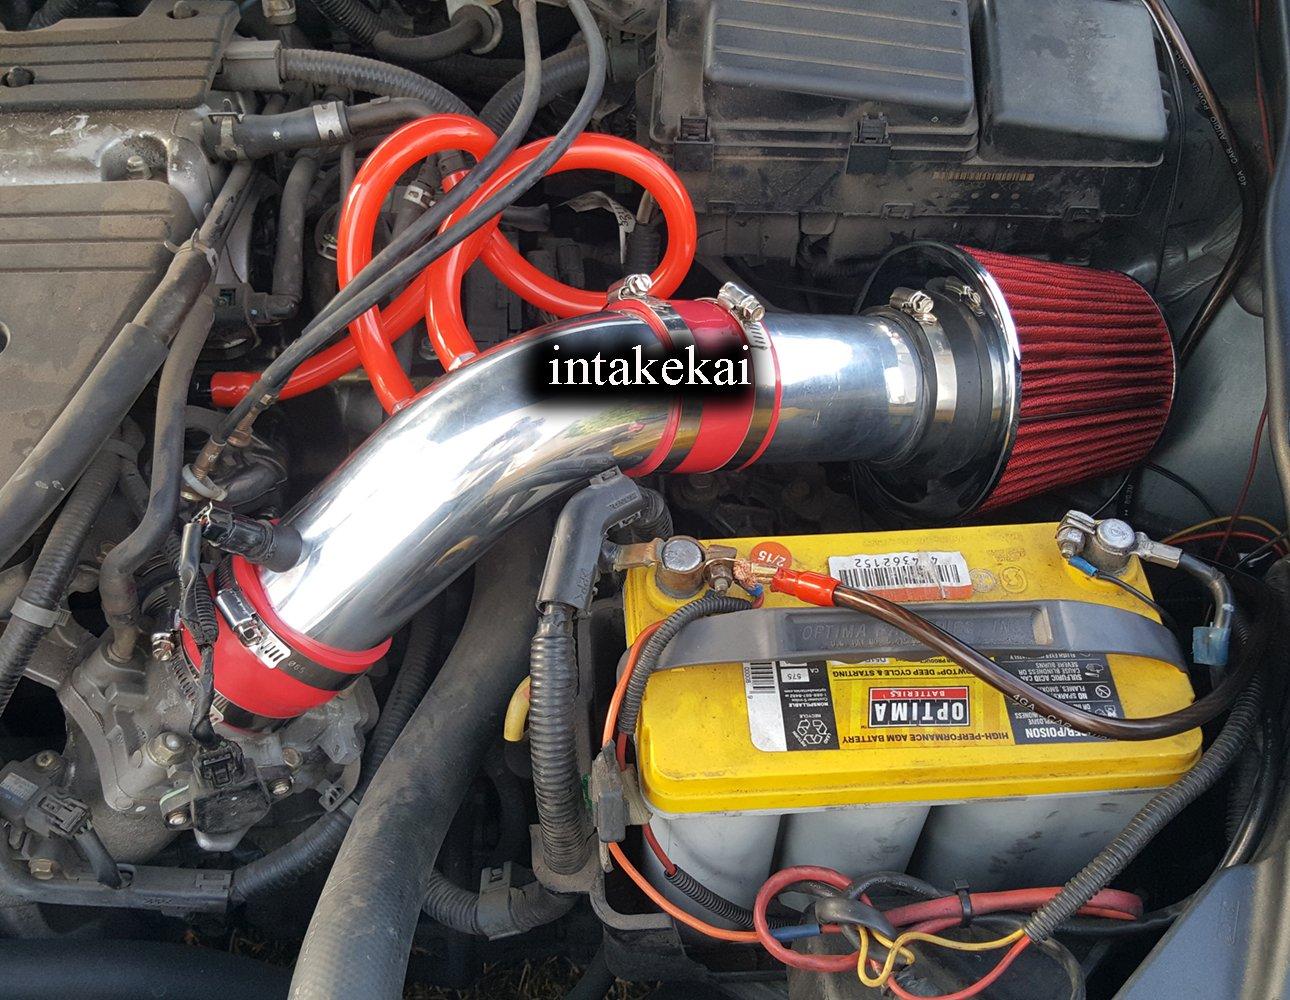 Performance Air Intake for 2004 2005 2006 2007 2008 ACURA TSX 2.4 l4 BASE ENGINE (RED) INTAKE KAI